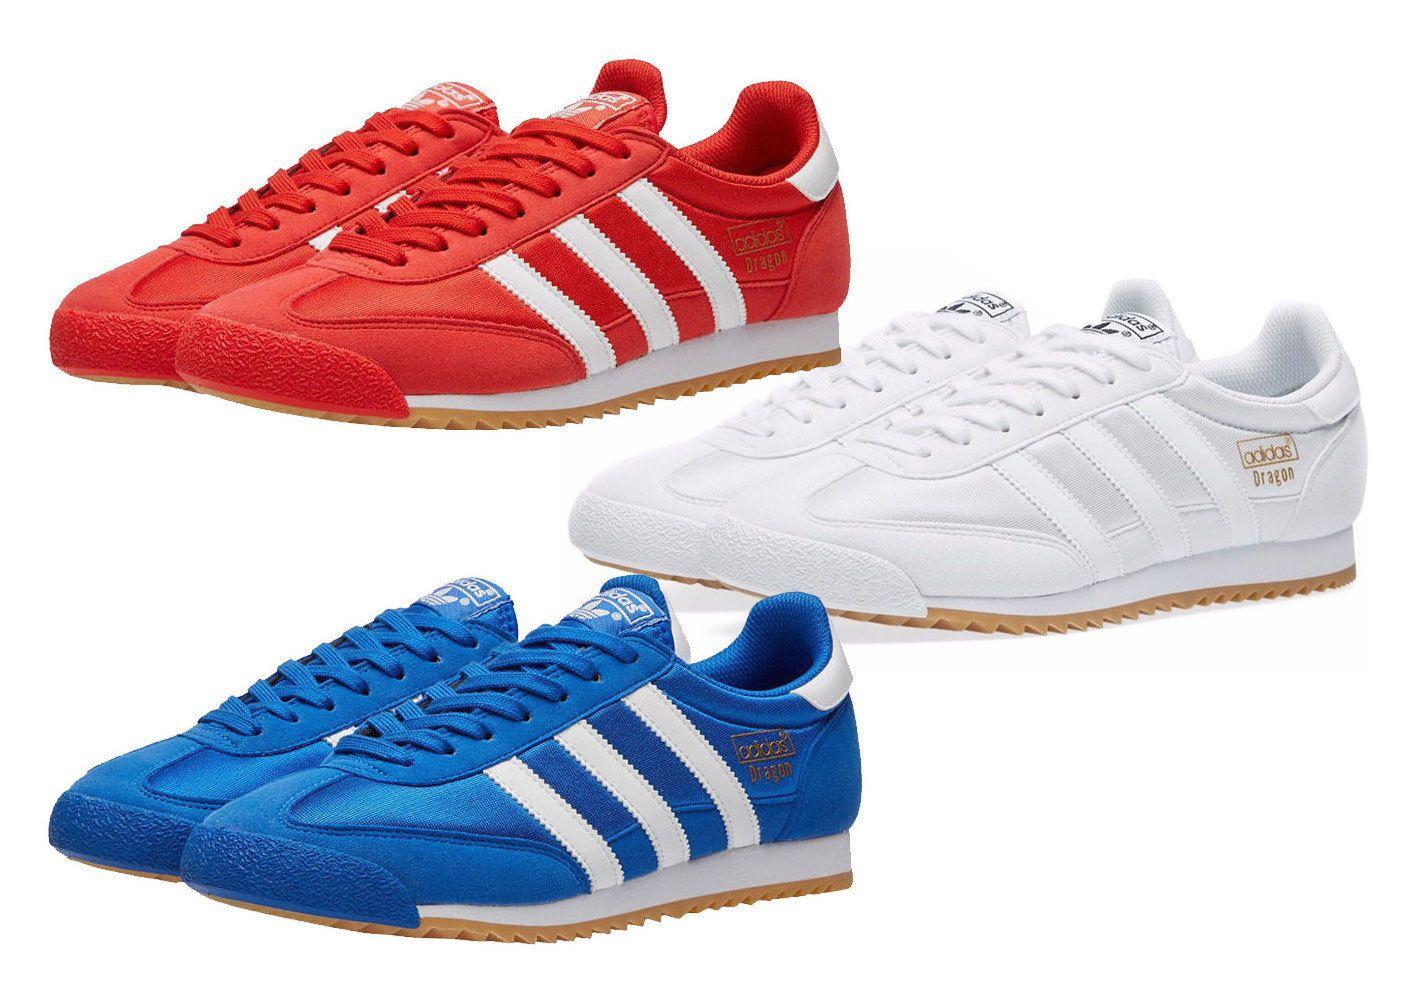 New ADIDAS Originals Dragon Mens Sneaker Superstar red blue ...